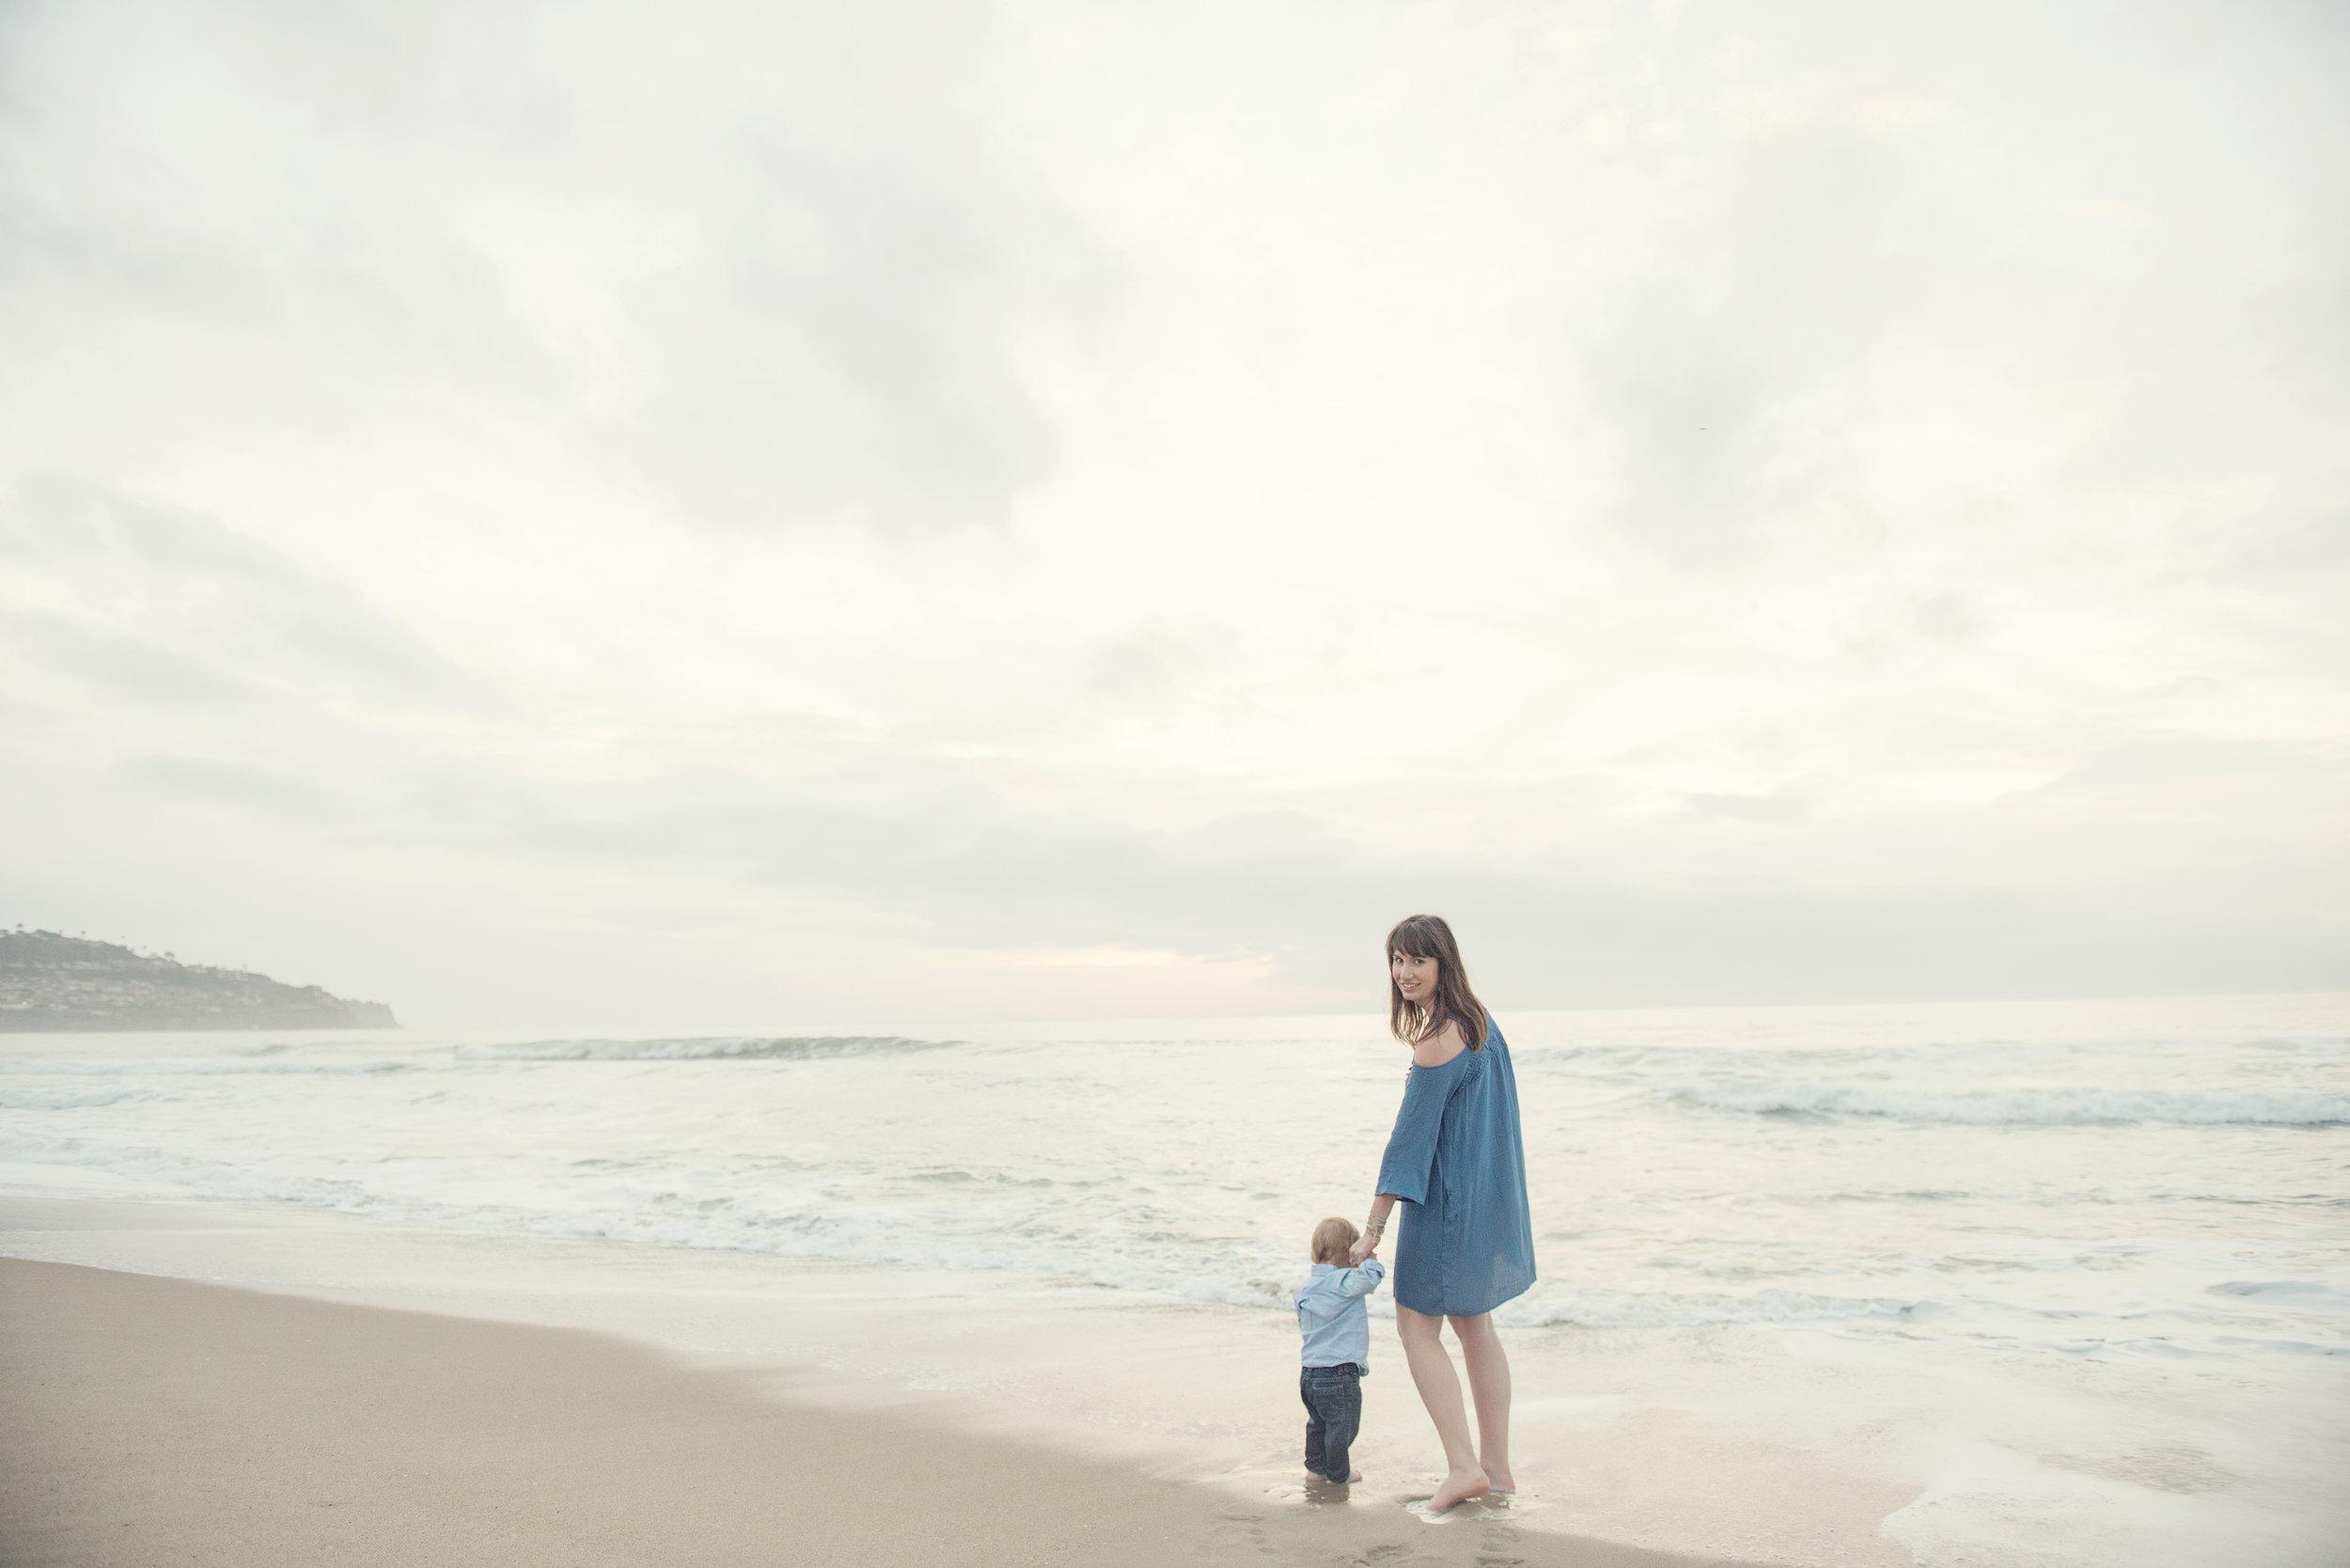 sample_beach-10.jpg